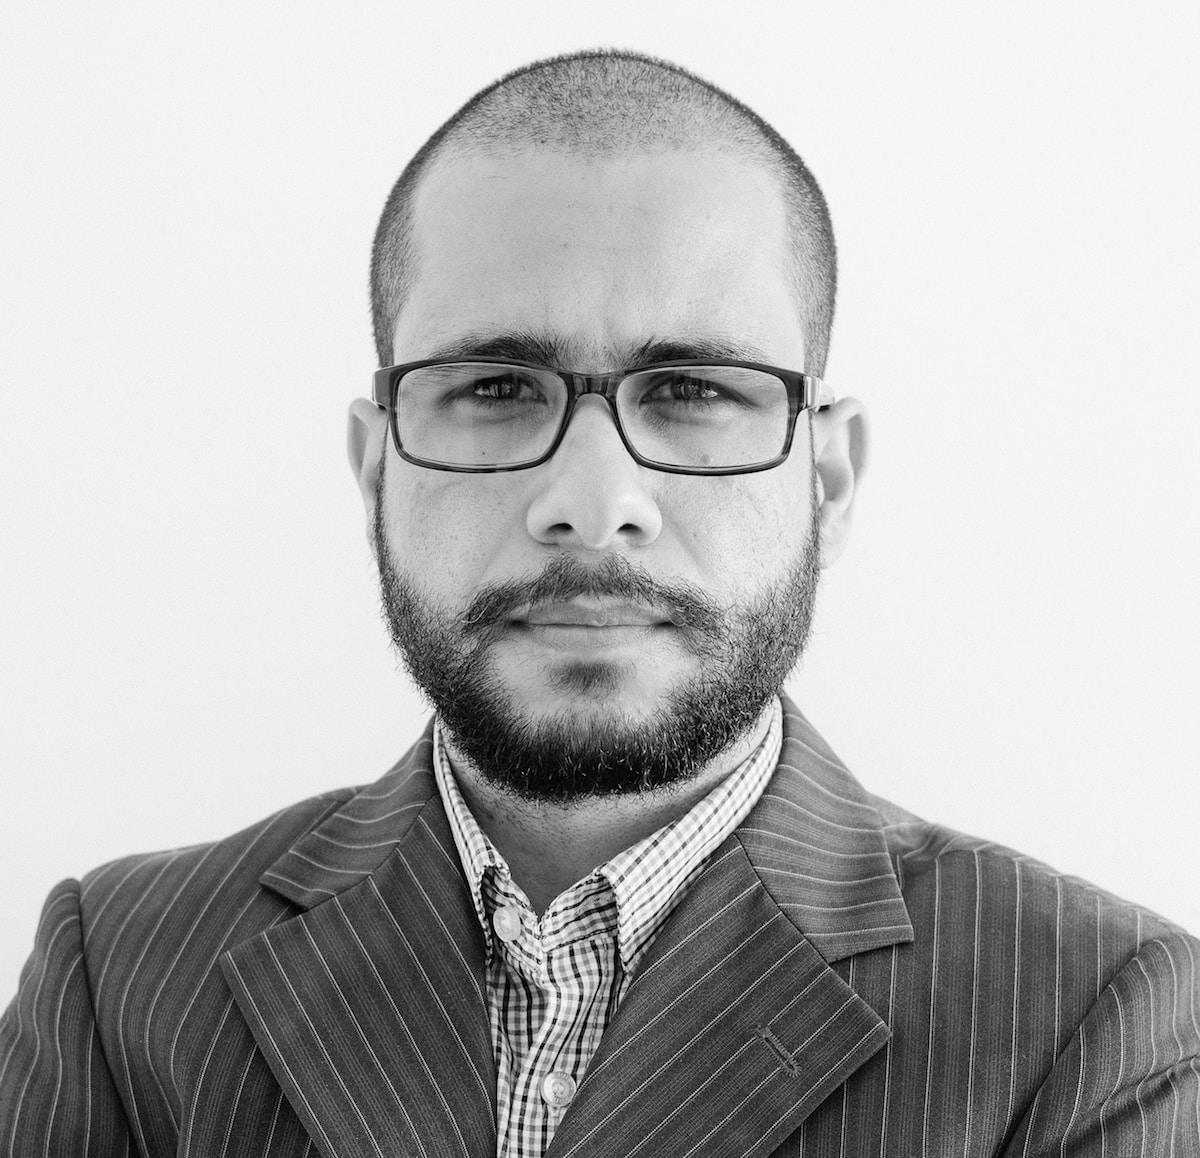 Avatar of user Bruno Luz